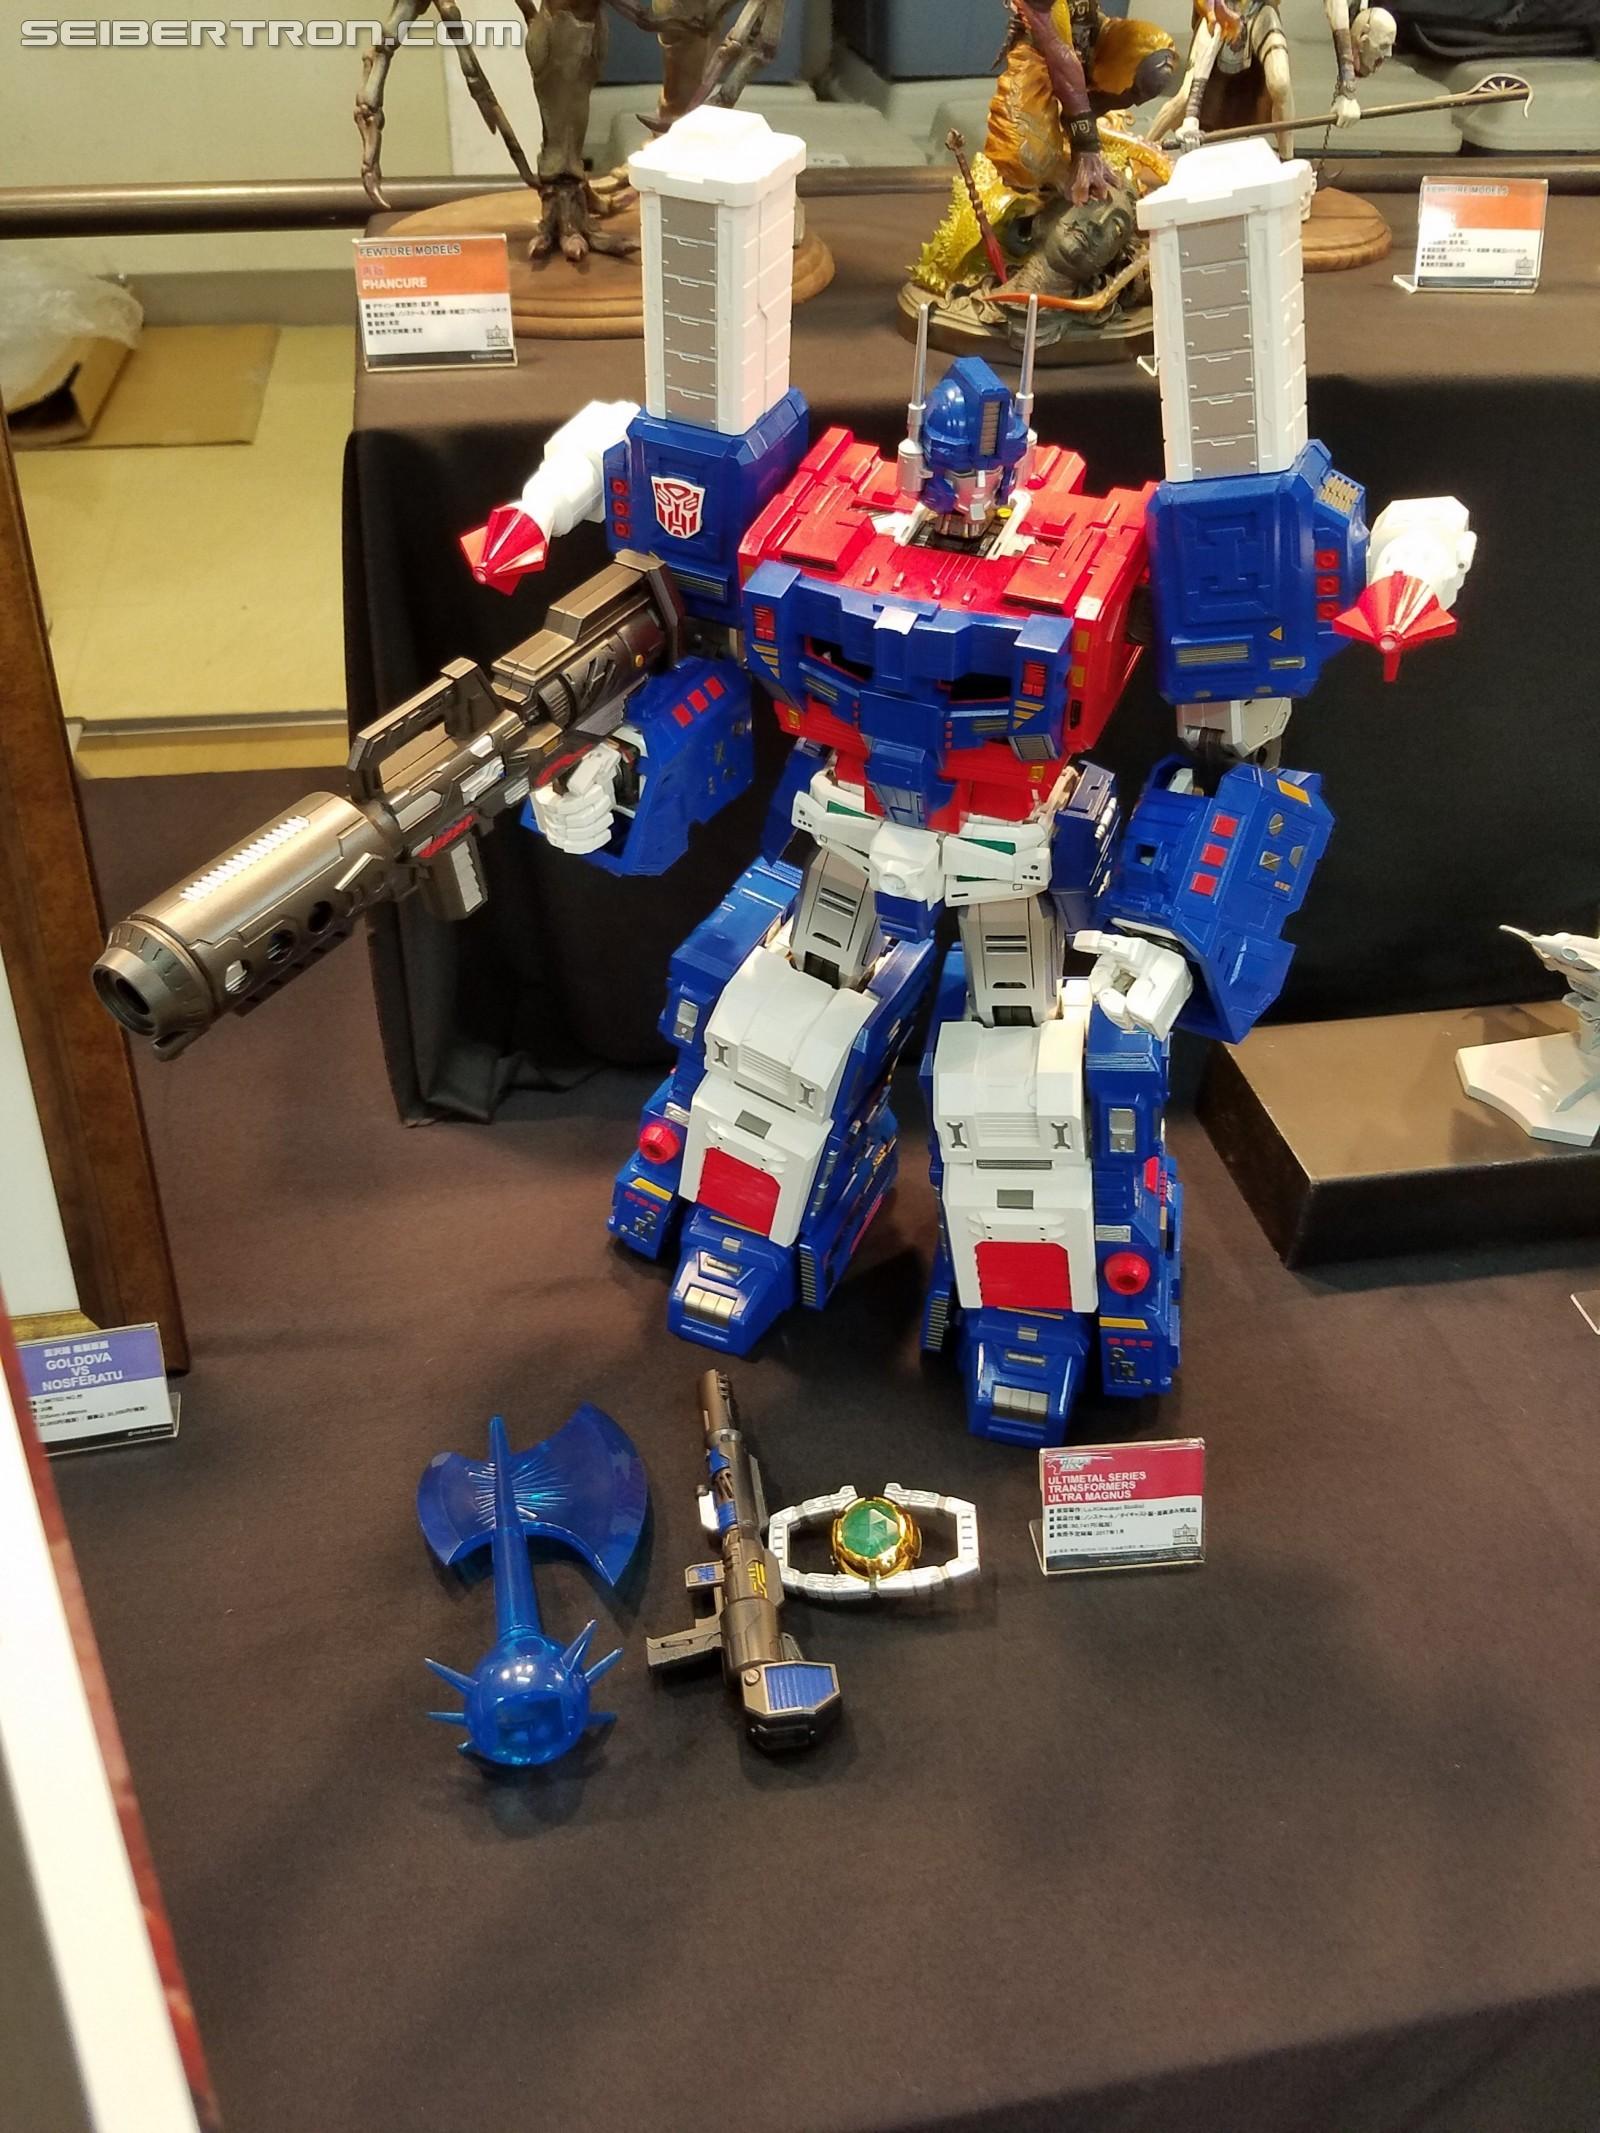 Transformers News: Re: Ultimetal UM-1 Optimus Prime, Ultra Magnus and more